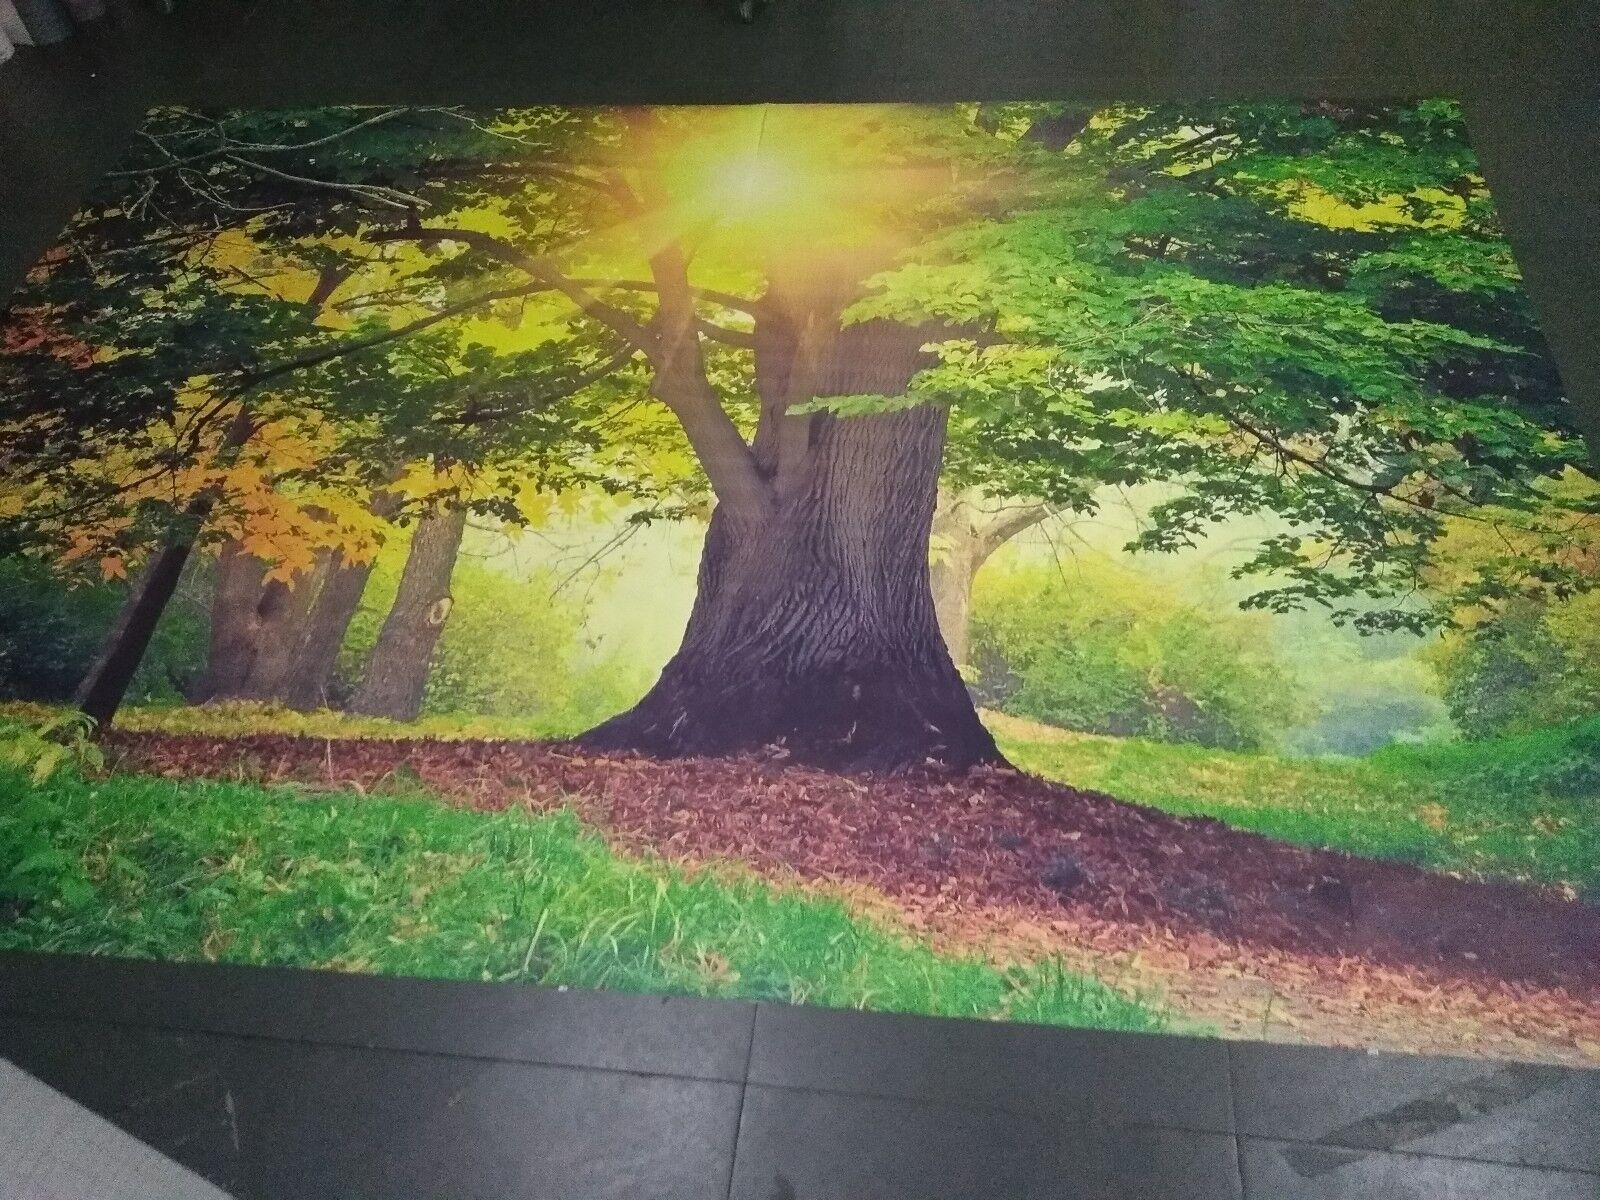 3D outdoor Big tree sun Wall Paper wall Print Print Print Decal Wall Deco Indoor wall Mural 71f666